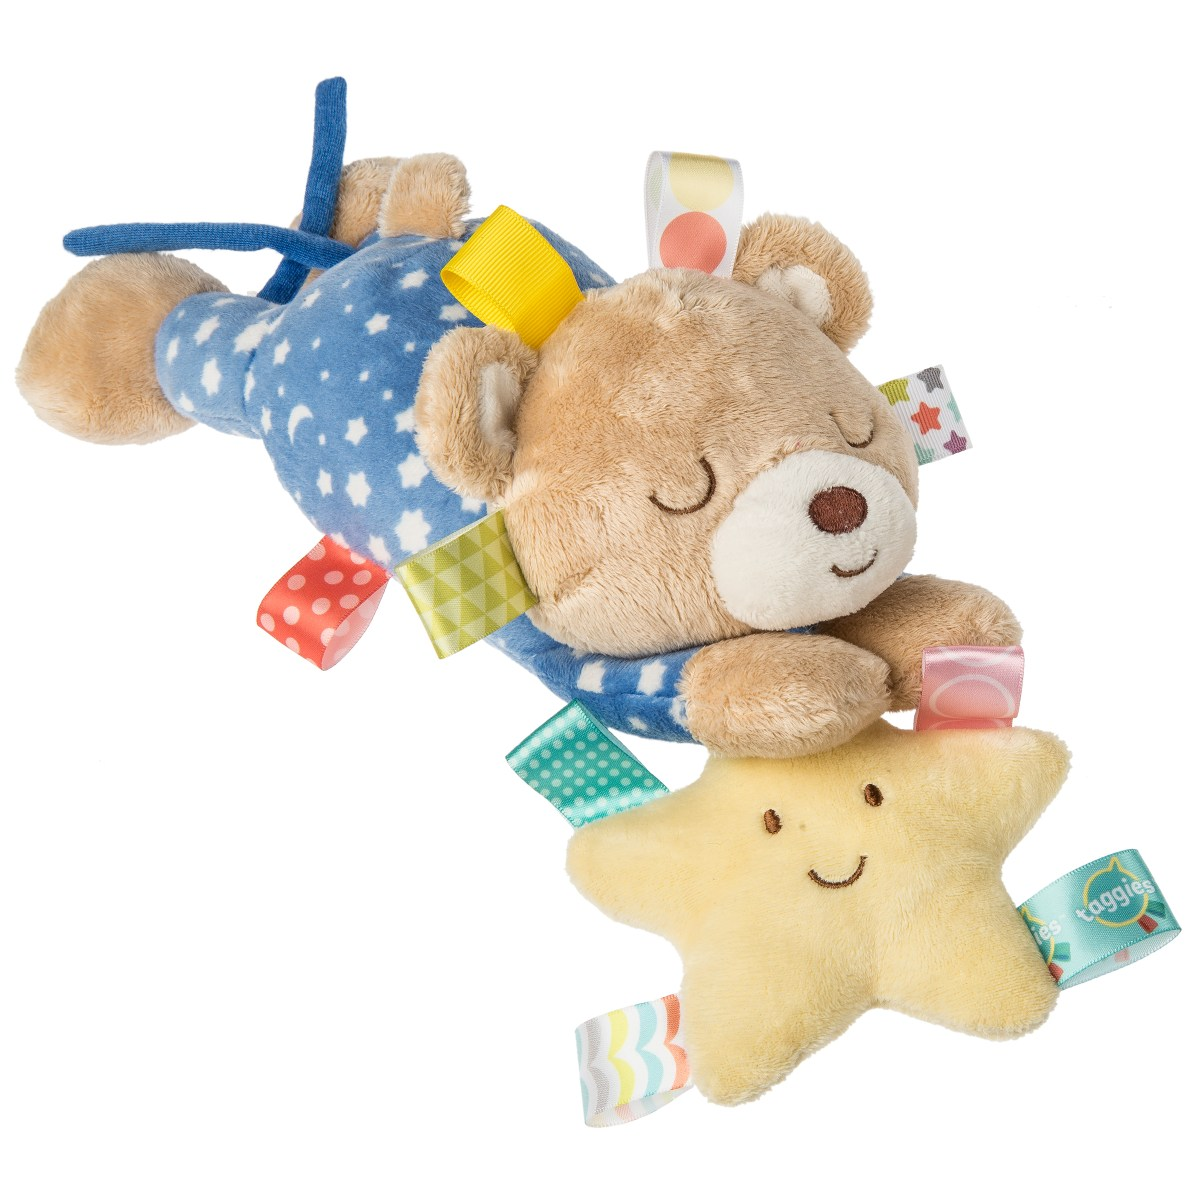 Plush Bear Starry Night